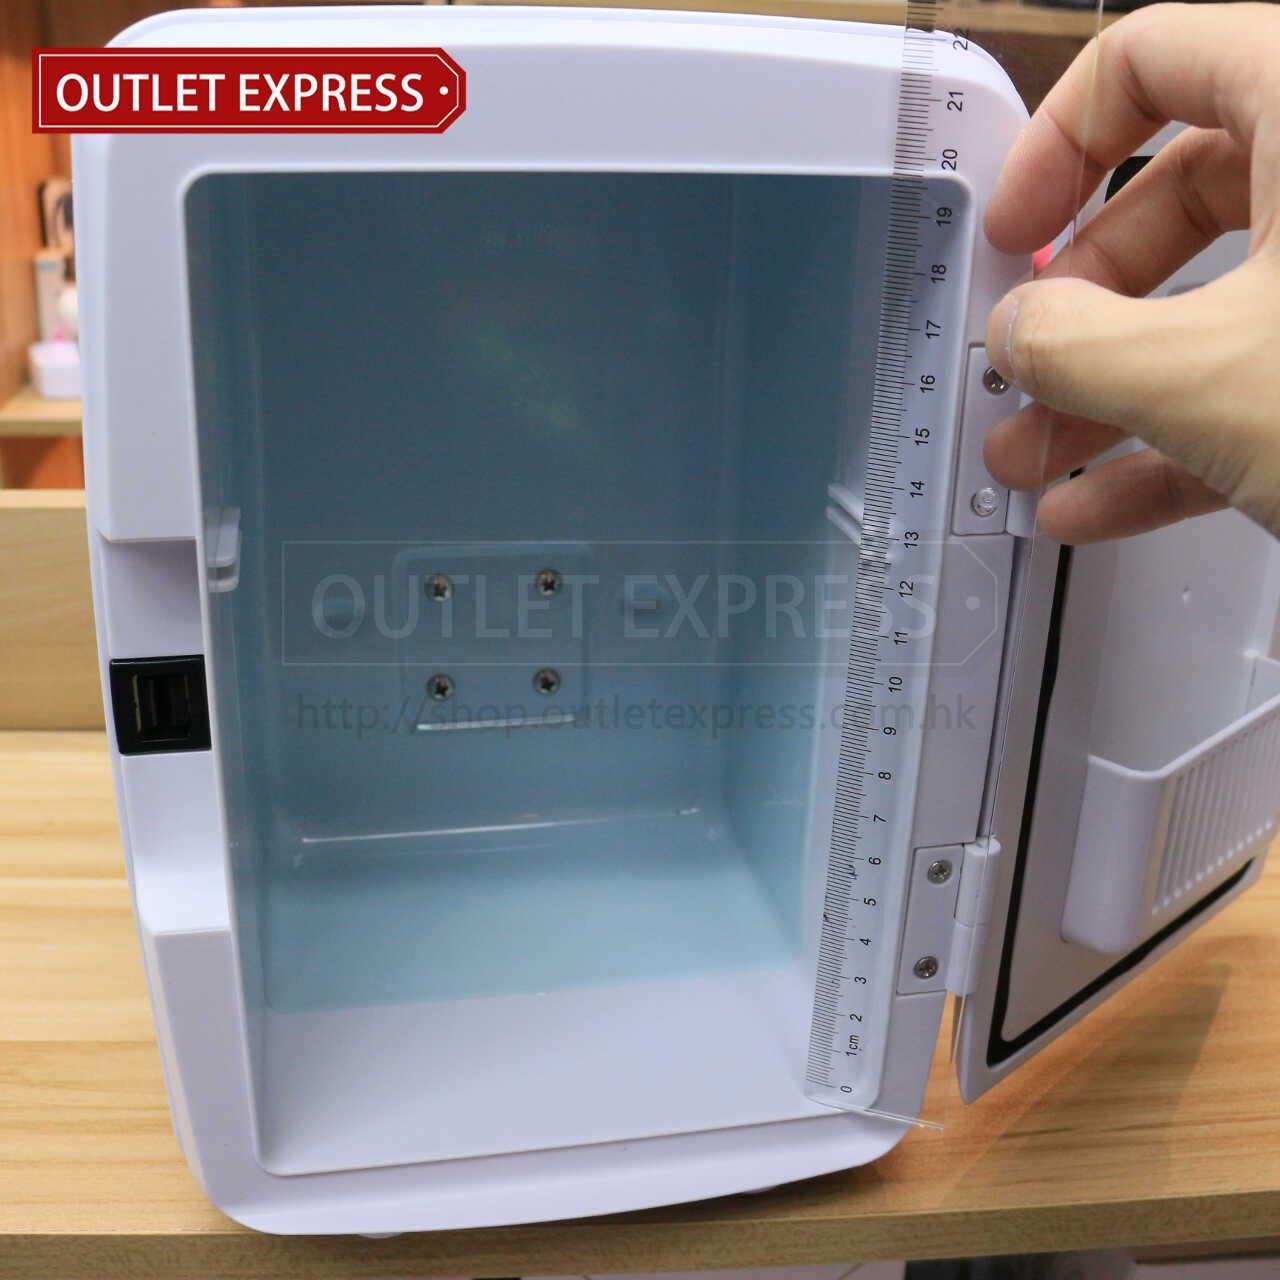 4L 冷暖兩用迷你小雪櫃 | 可車載或家用 內部高度- Outlet Express HK生活百貨城實拍相片